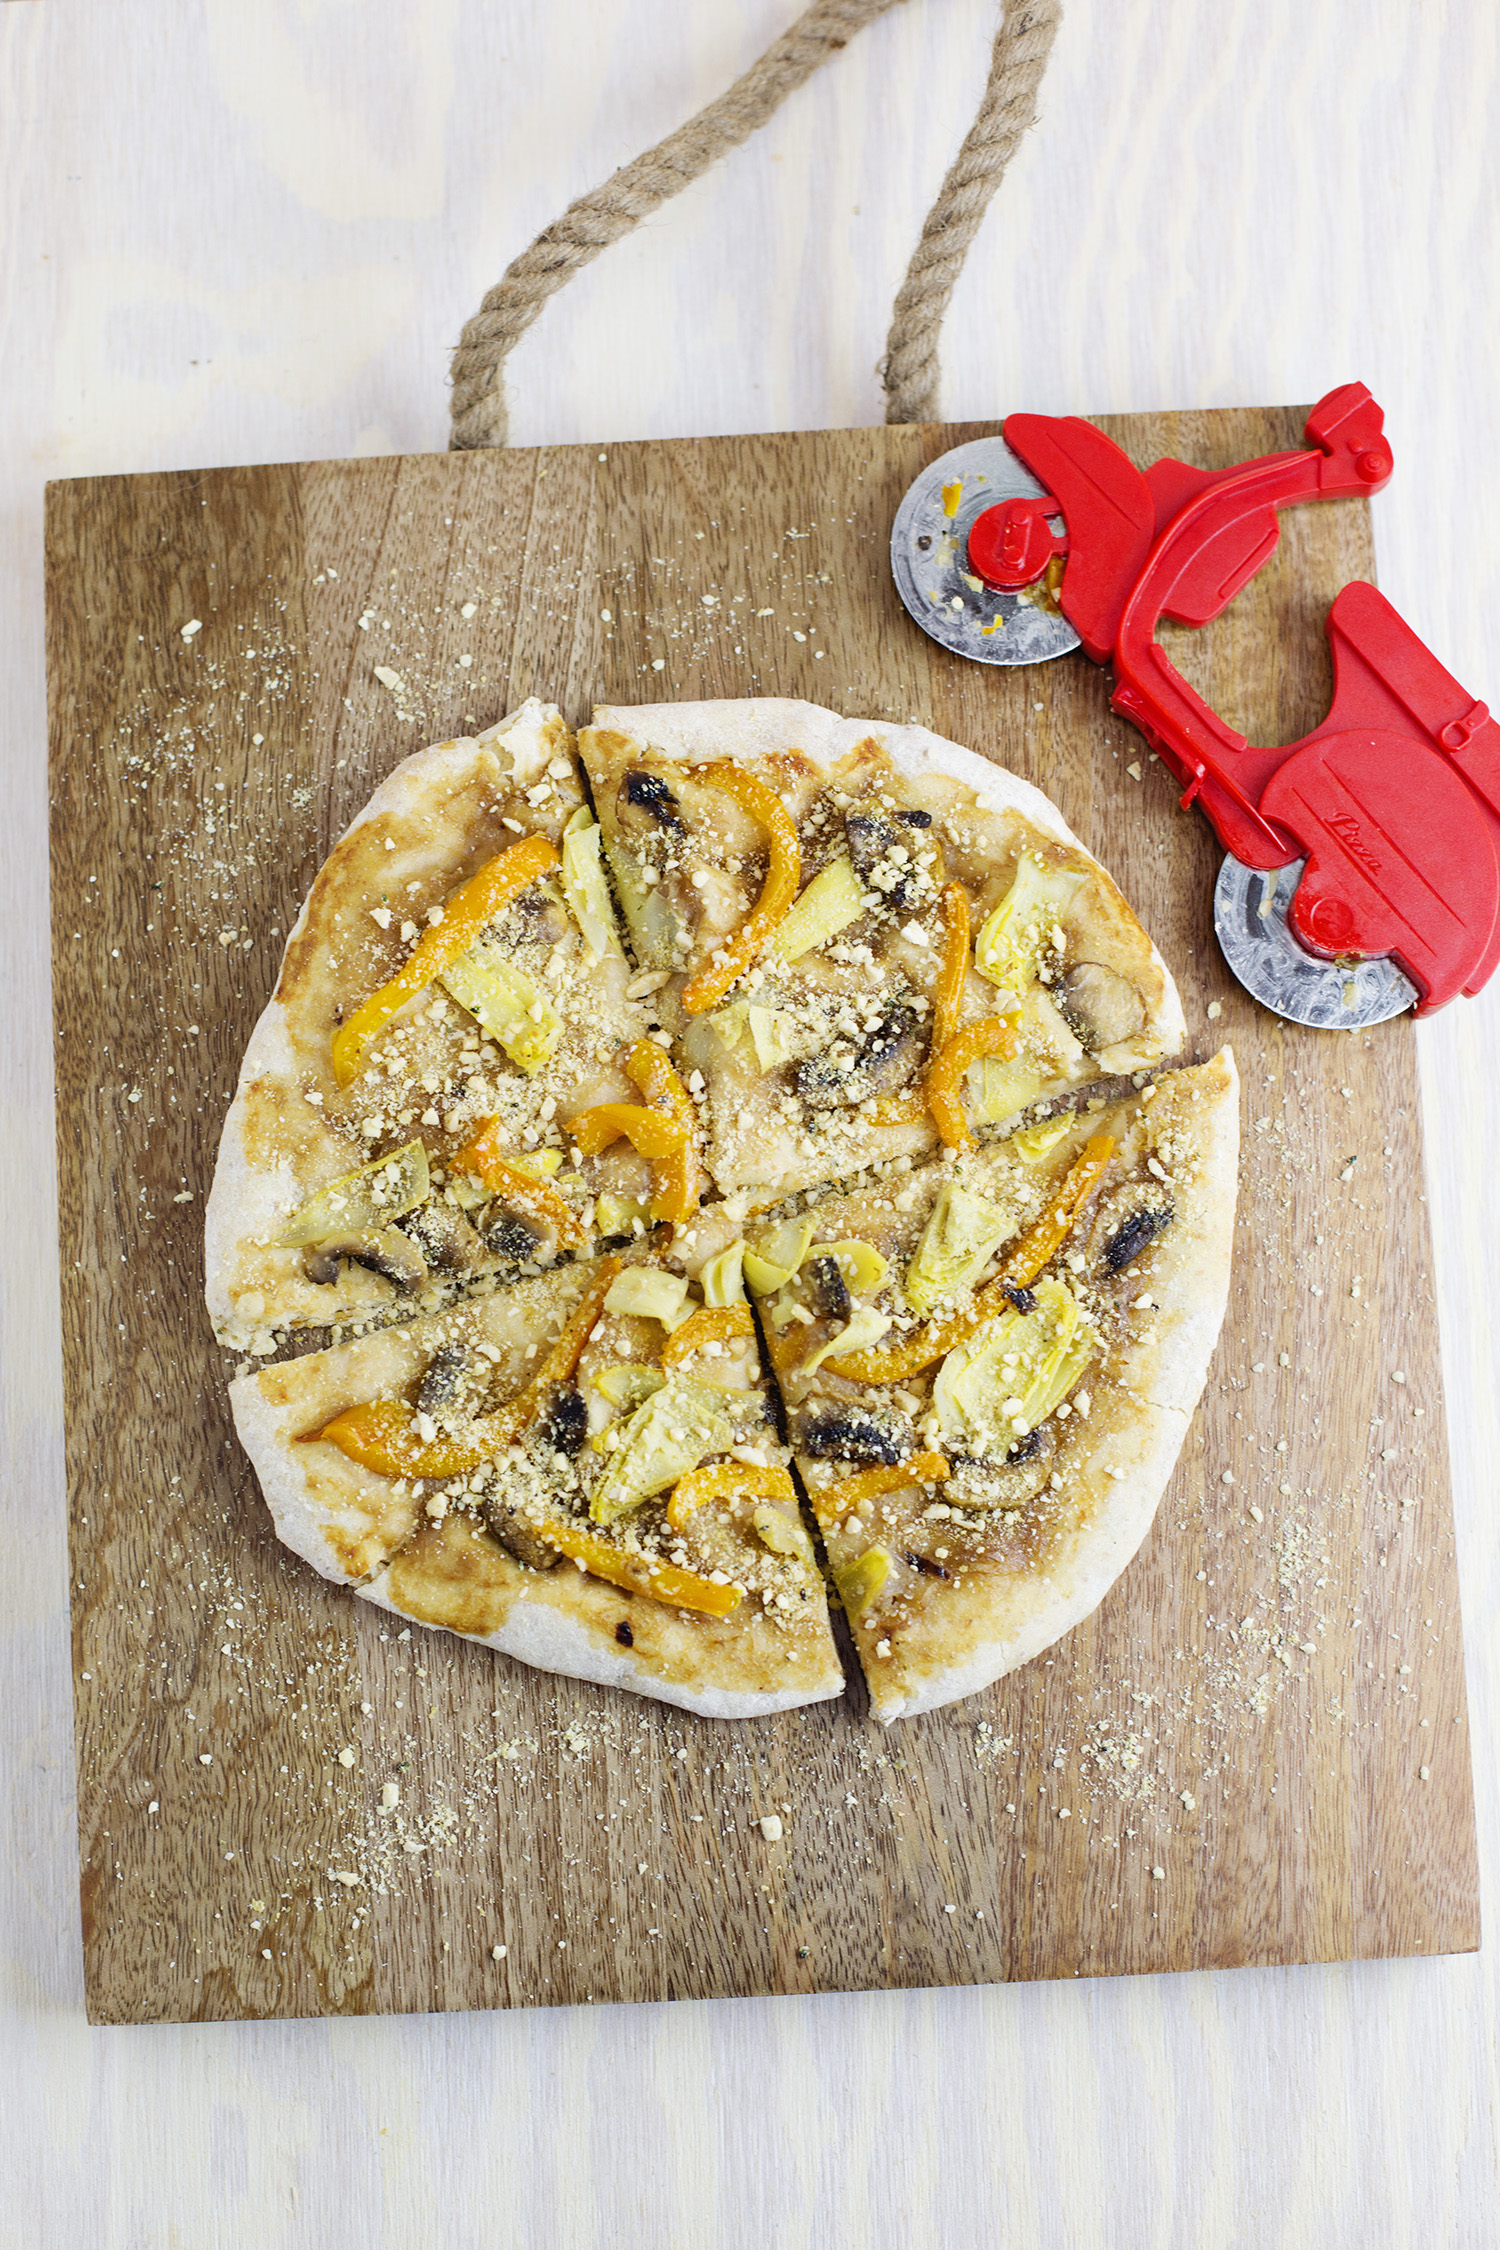 Homemade Vegan Frozen Pizzas (via abeautifulmess.com)